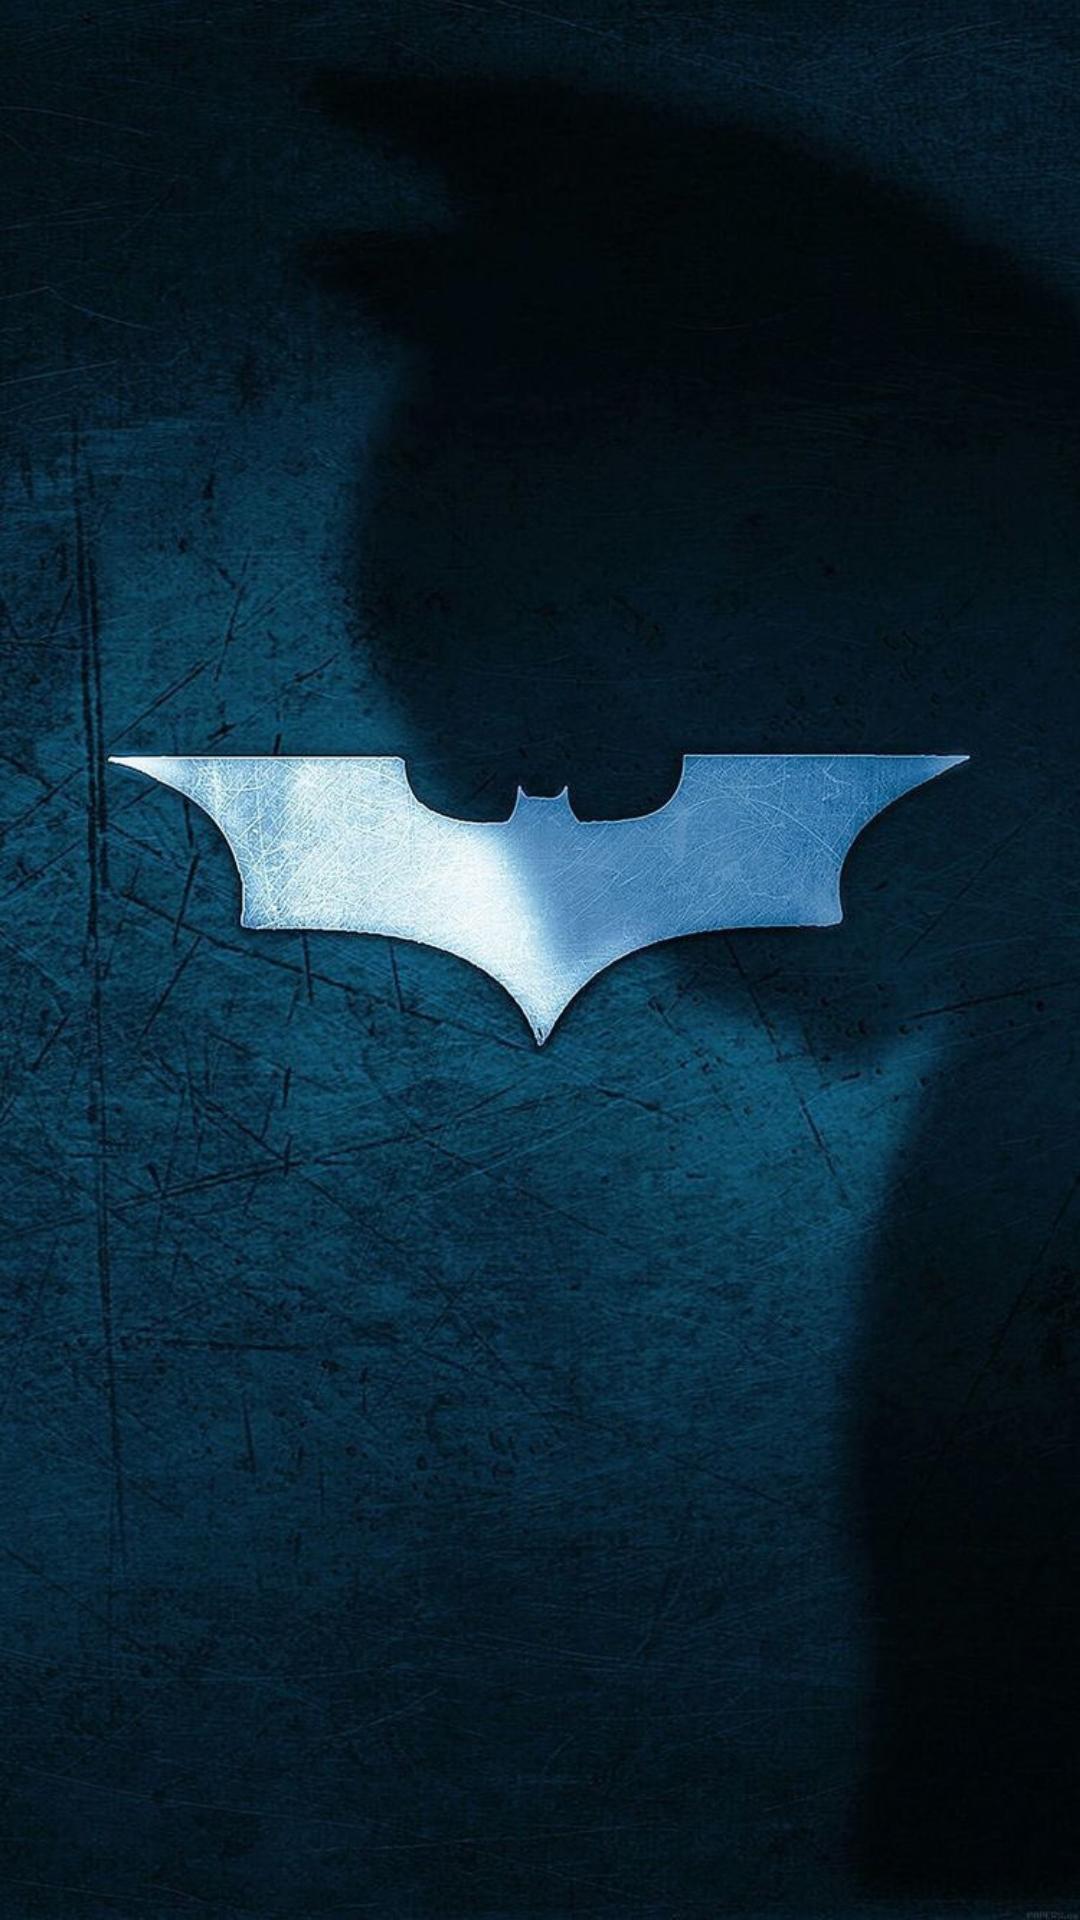 Batman Cartoon Comic Dark Shadows Heroe Gotham City Cave Googles Cape Mask Superheroe Ba Batman Wallpaper Batman Wallpaper Iphone Batman Pictures